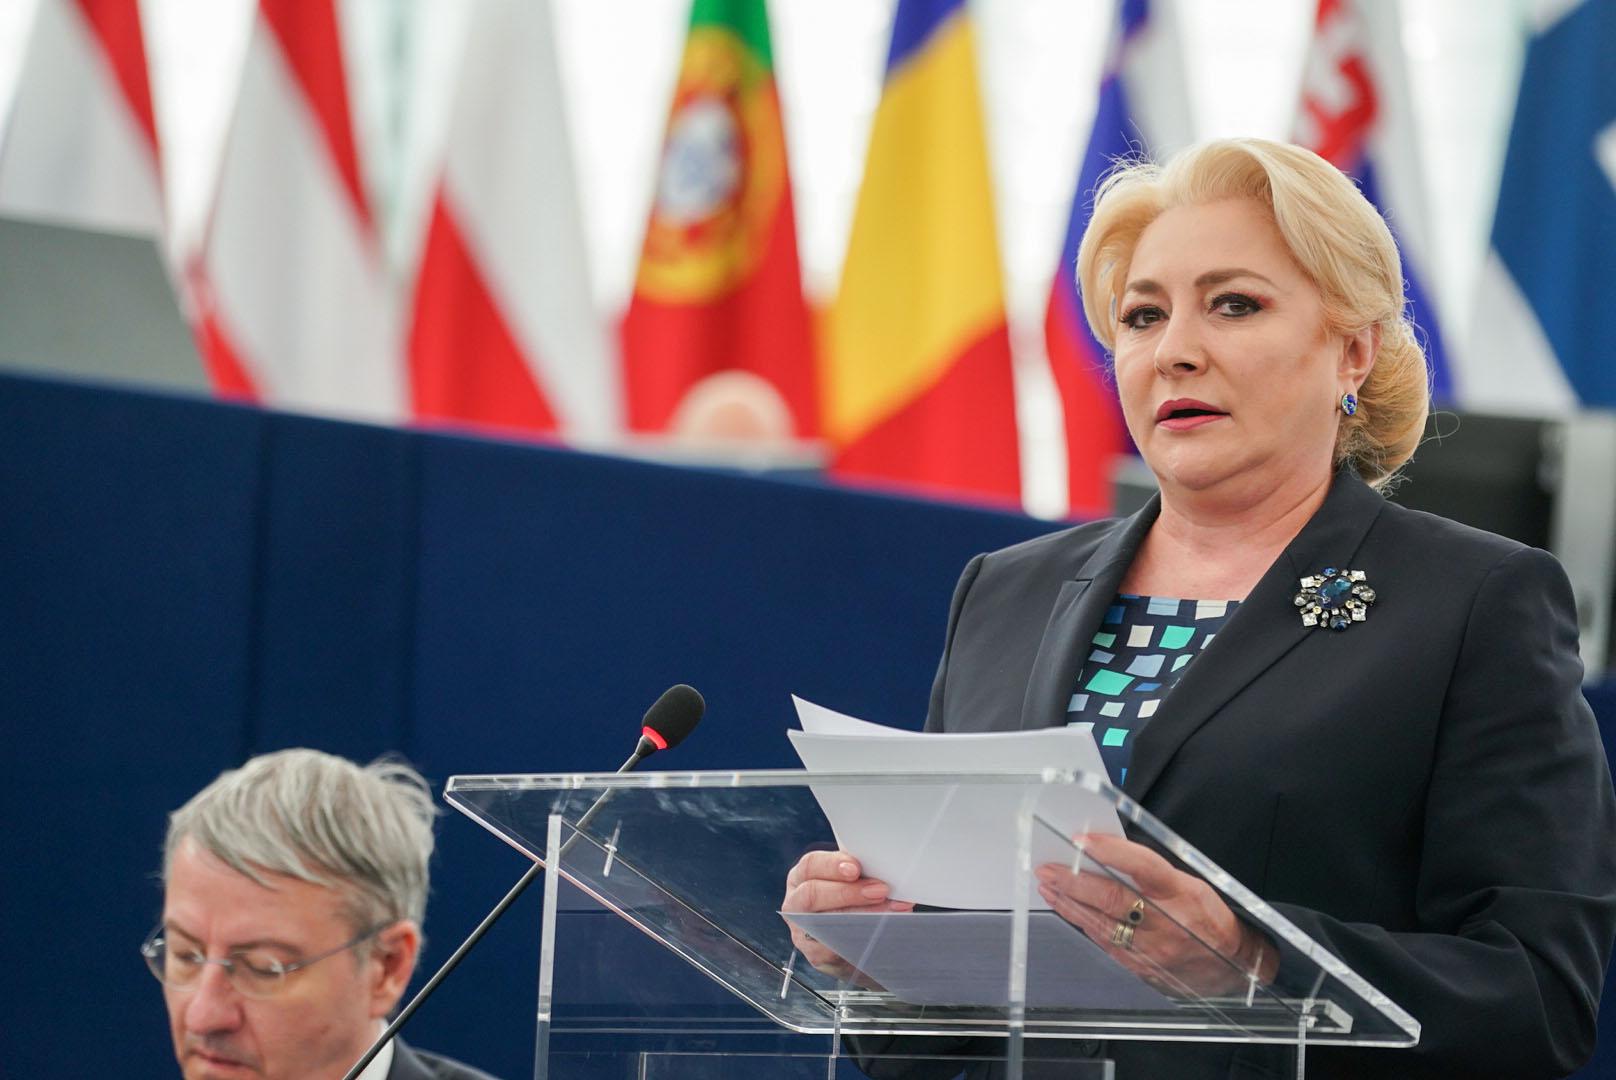 Romania: Dancila tries to avoid the vote of confidence